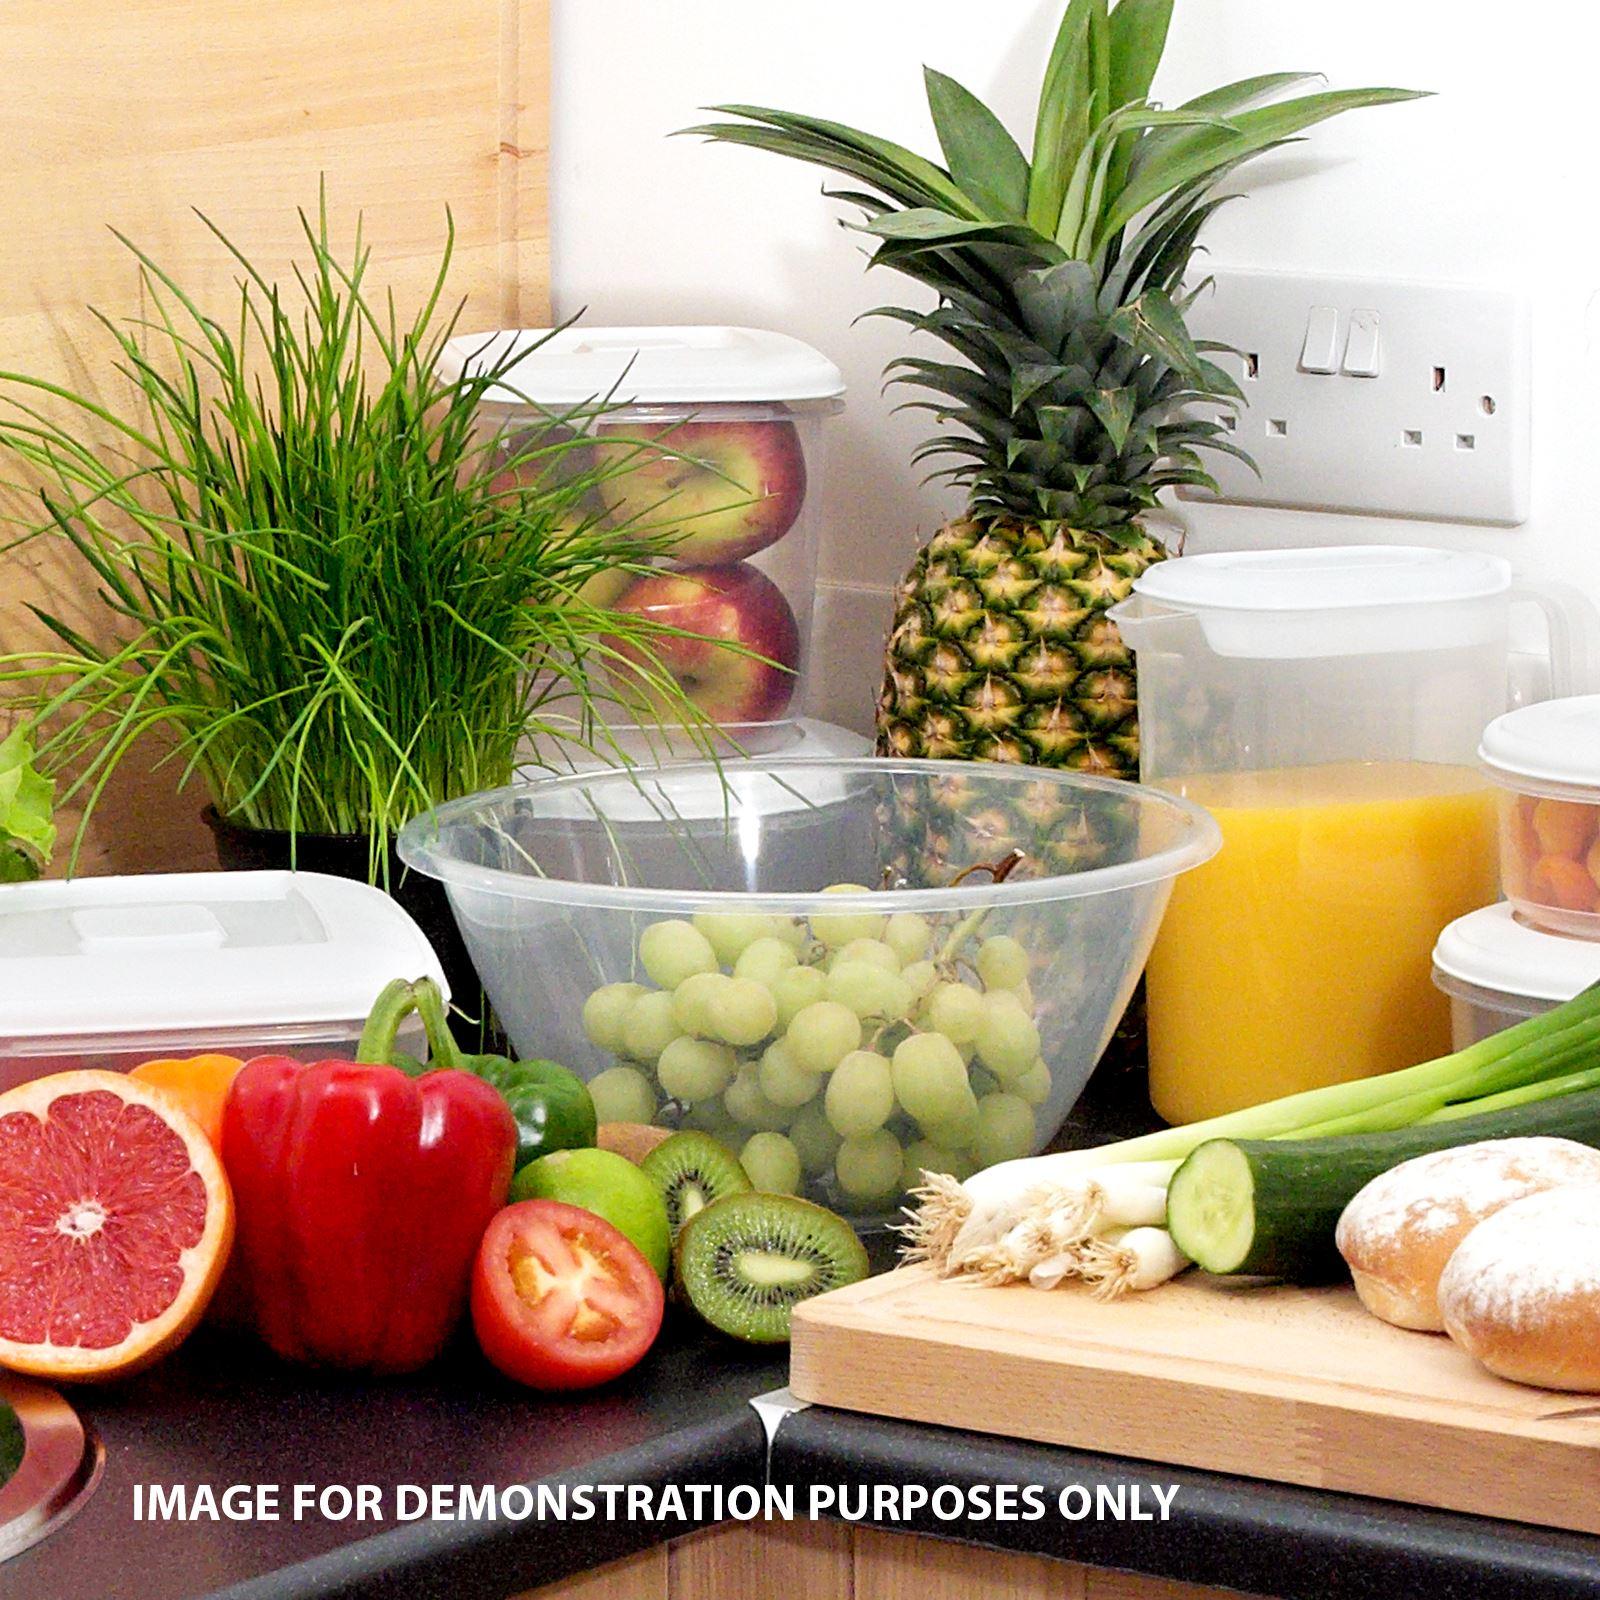 Clear-Plastic-Mixing-Bowl-Measuring-Baking-Salad-Serving-Cooking-Kitchen-Bowls thumbnail 9